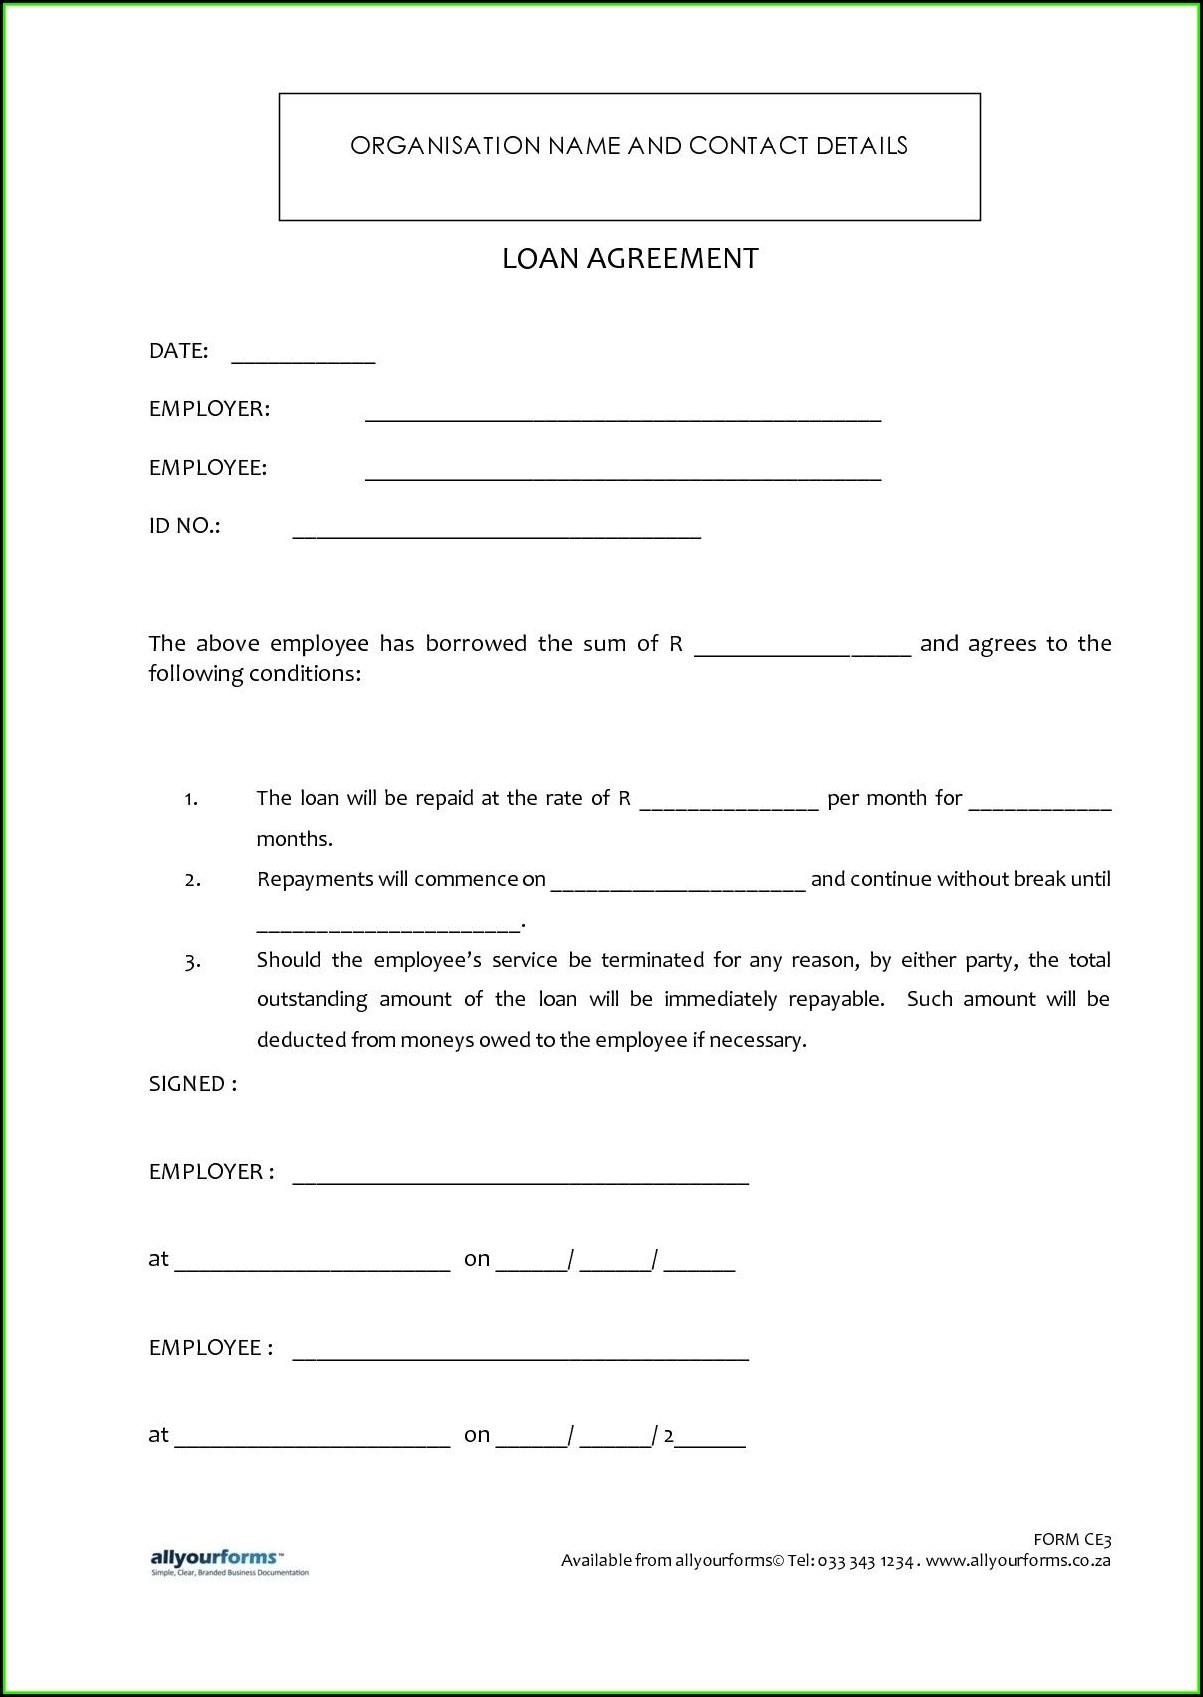 Loan Agreement Sample Format